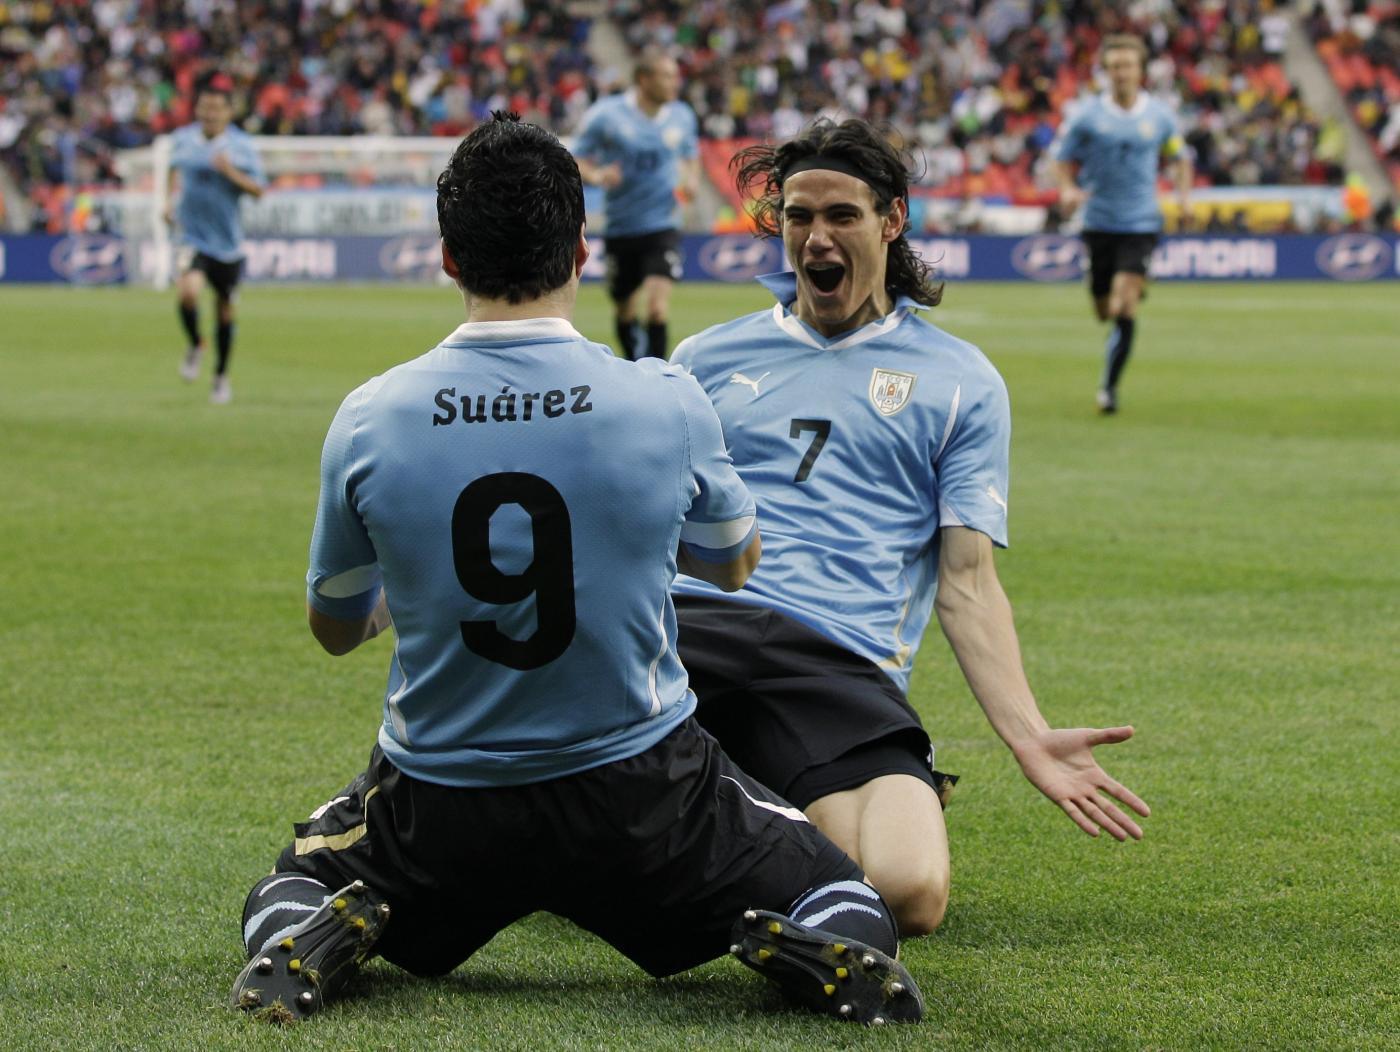 Італія – Уругвай. 5 питань матчу - изображение 3